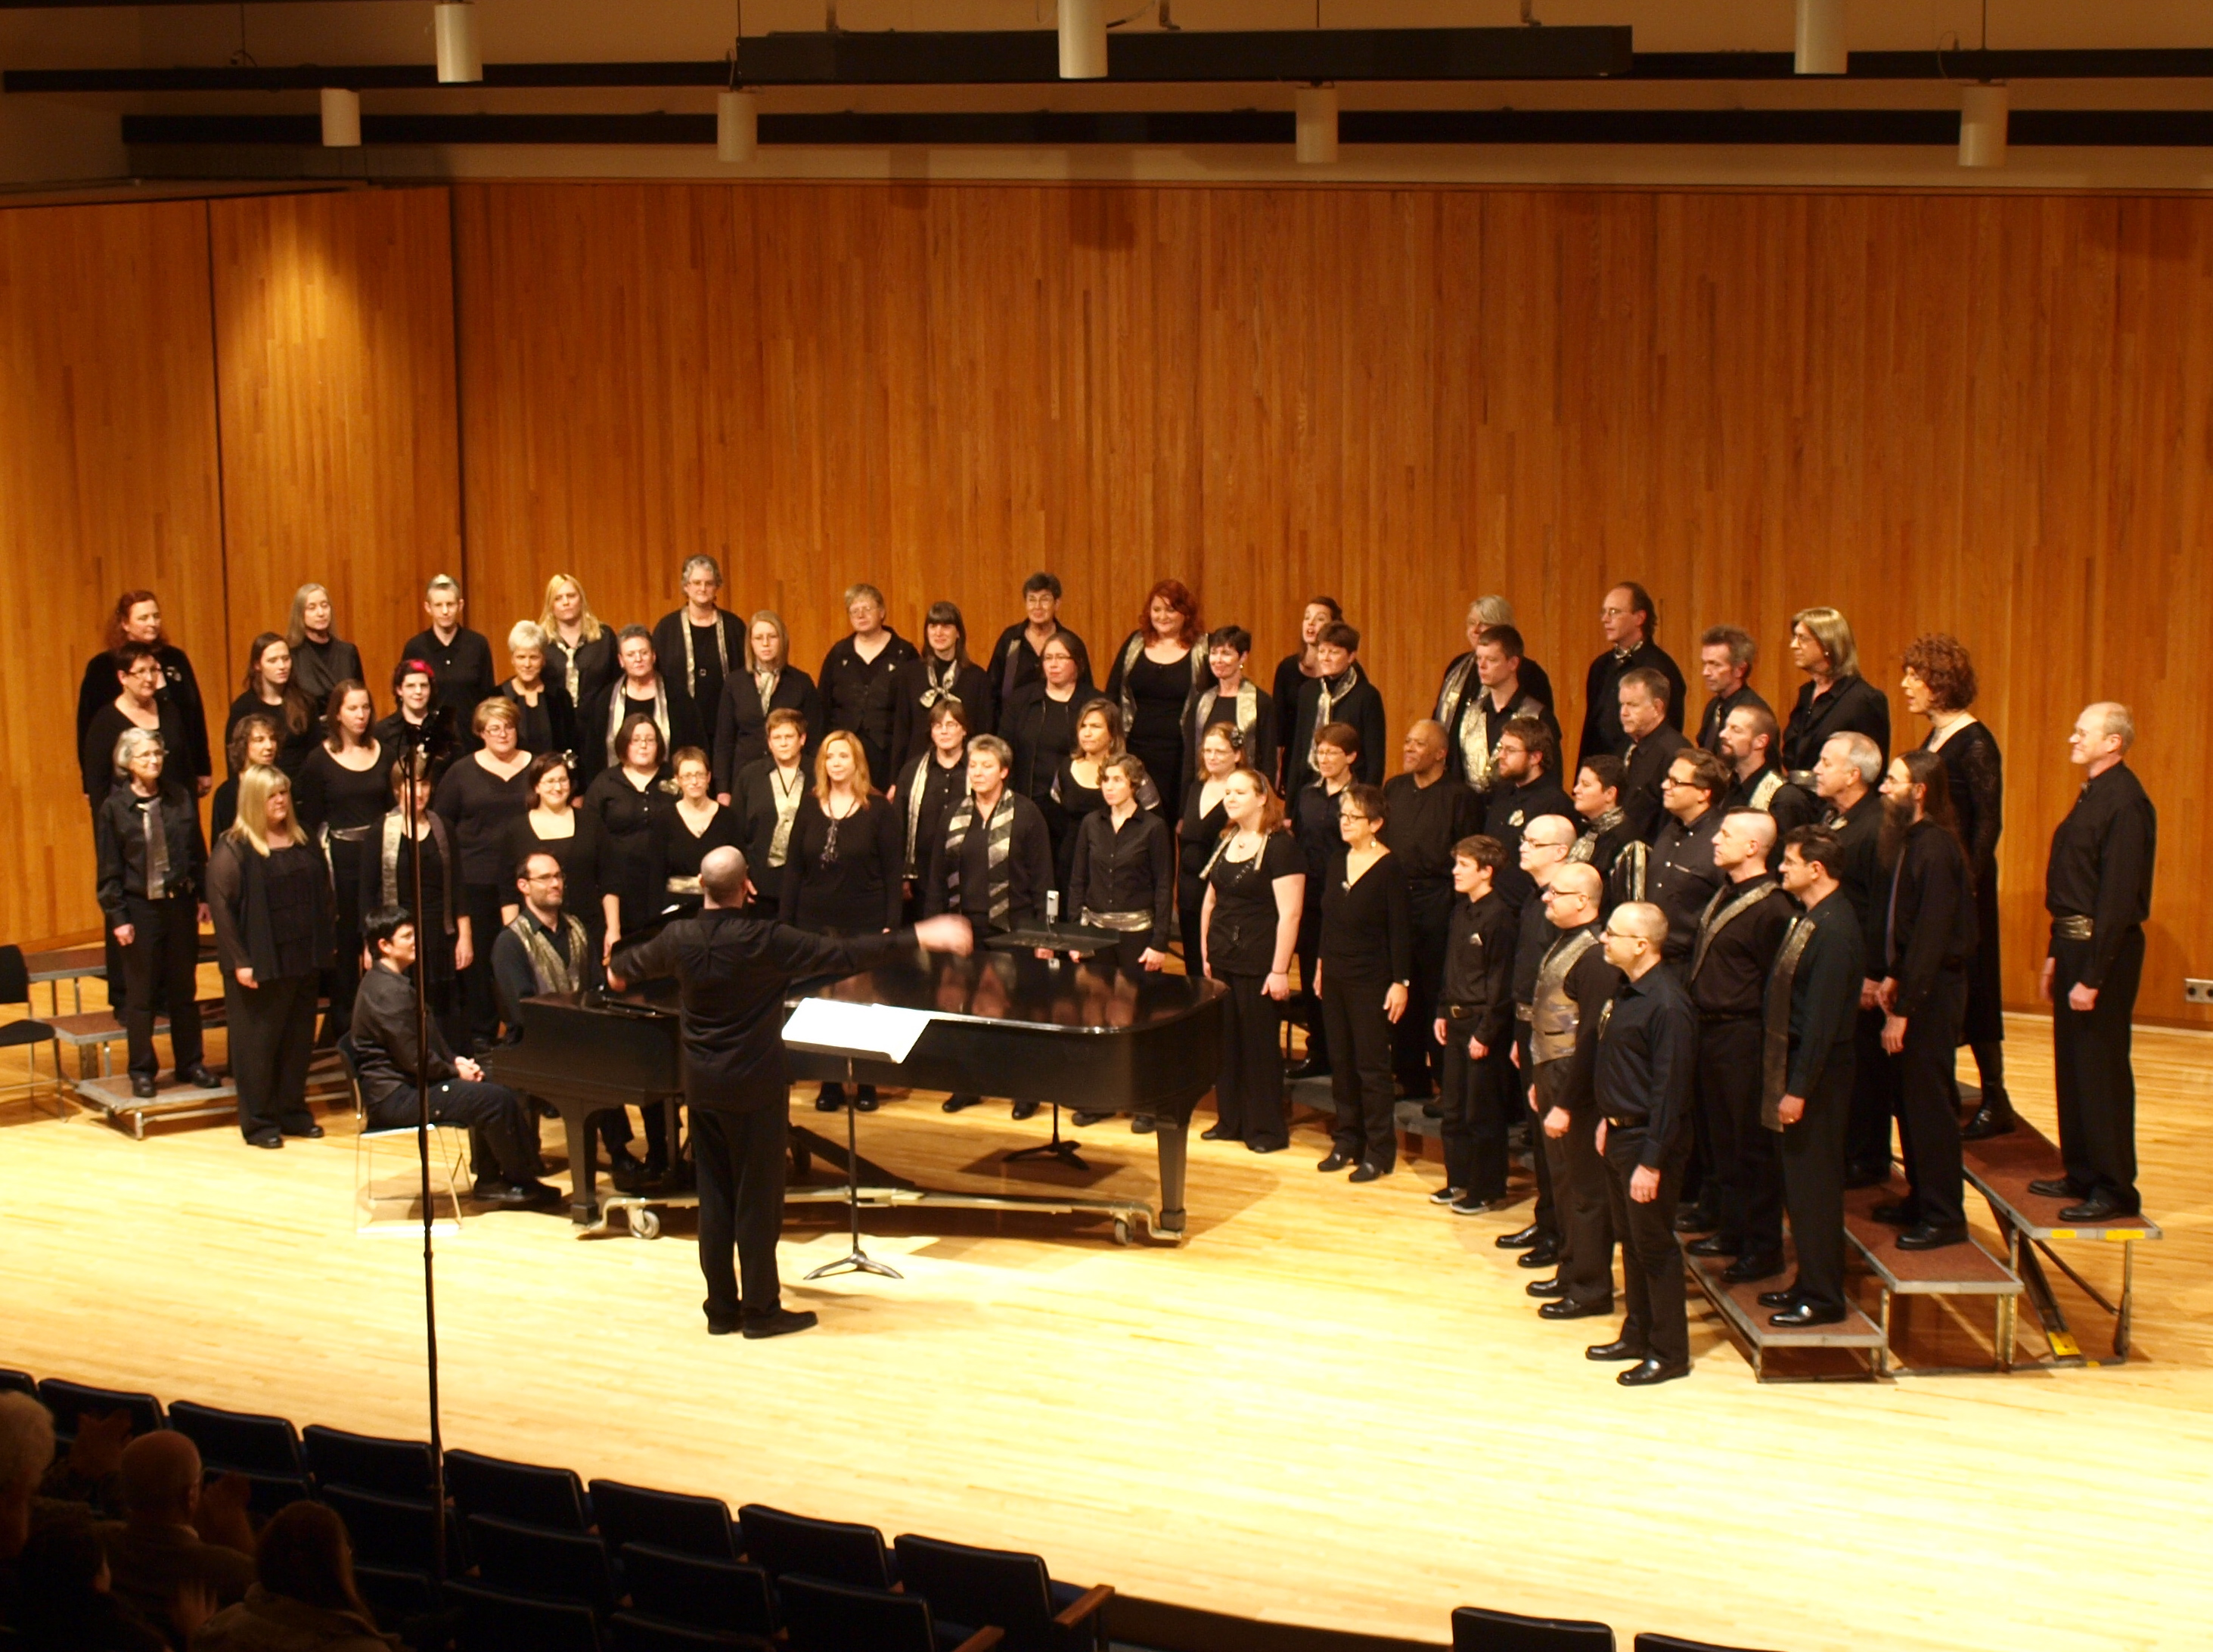 One Voice Mixed Chorus Provides Sanctuary